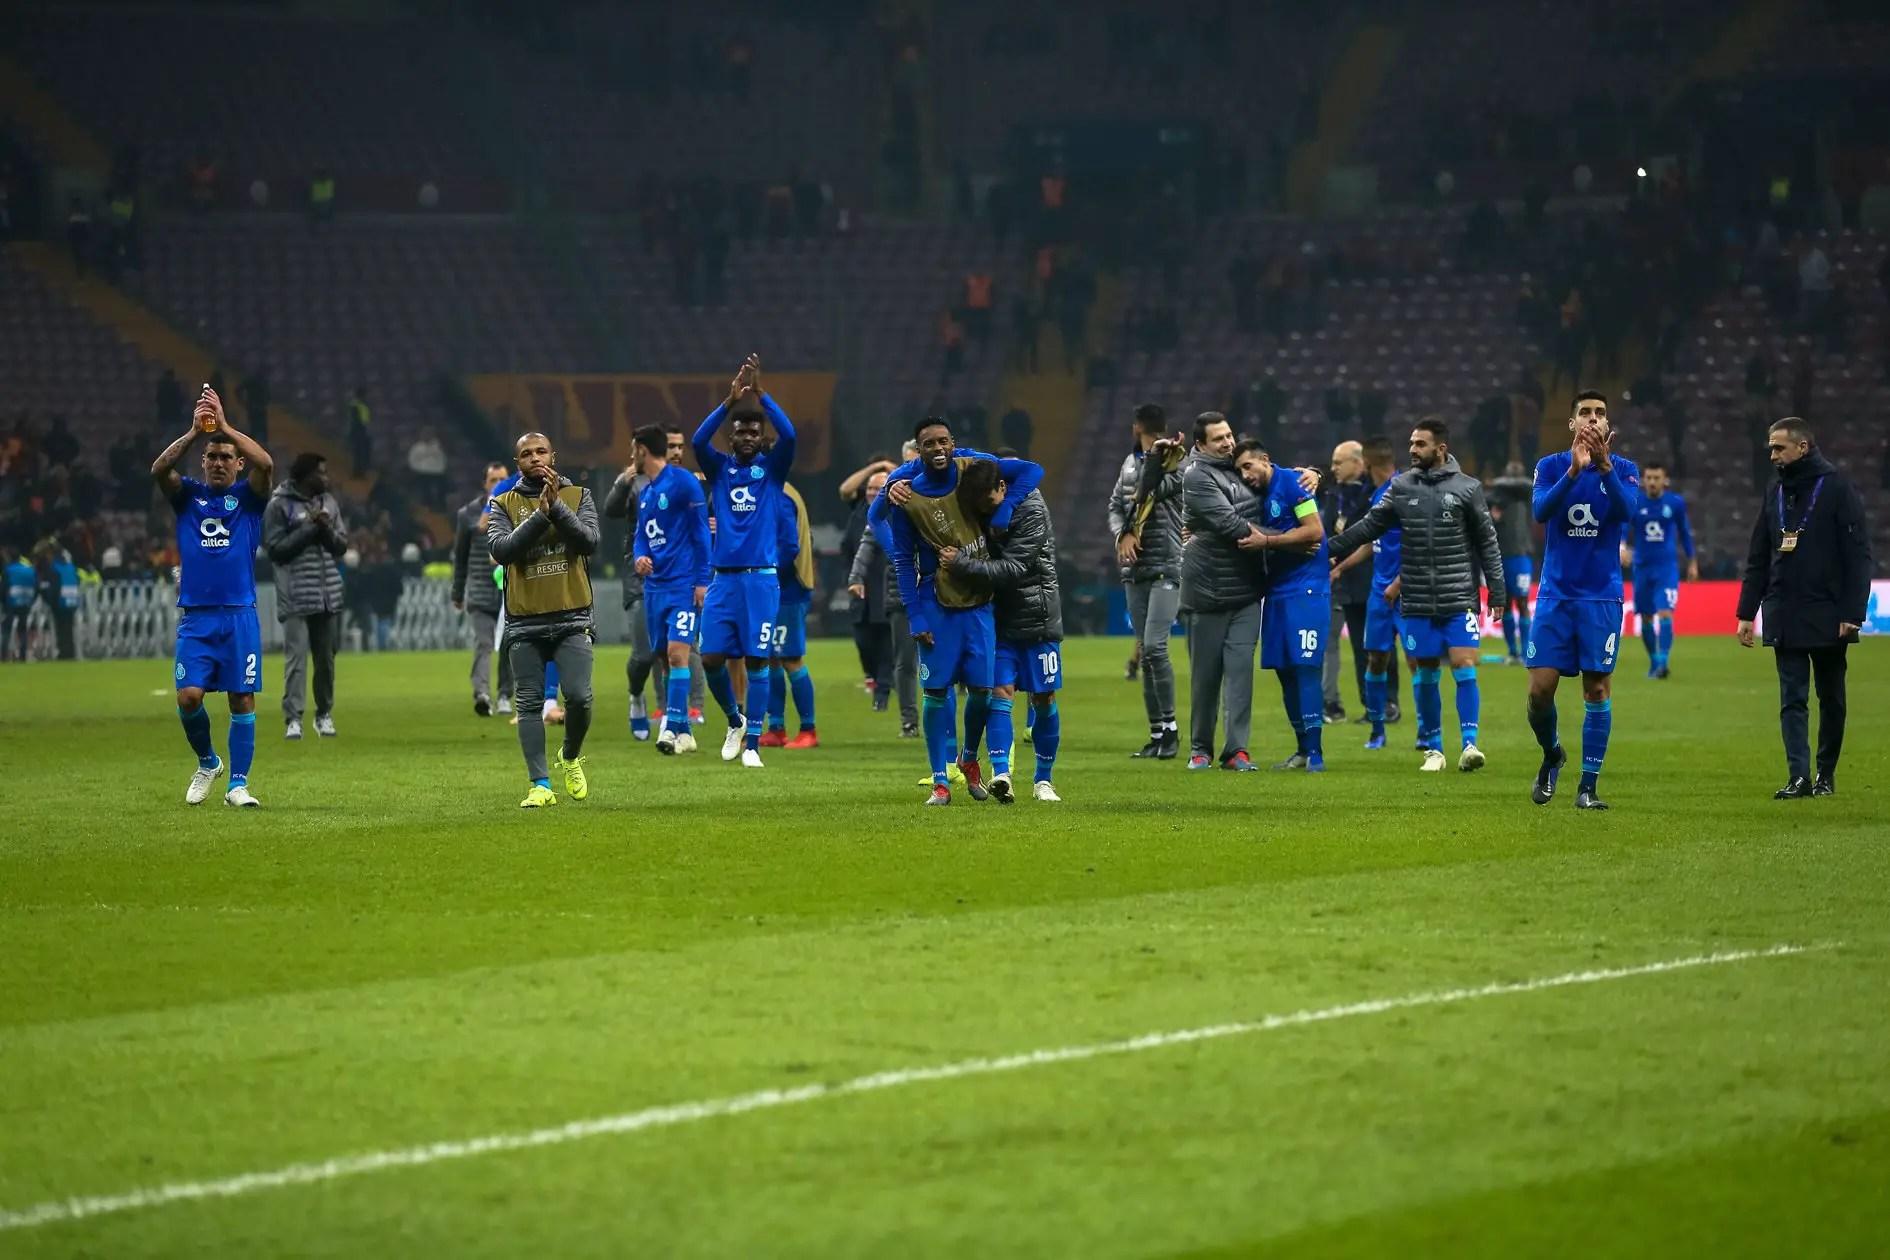 UCL: Onyekuru, Awaziem Subbed On As Galatasaray Lose 3-2 To Porto